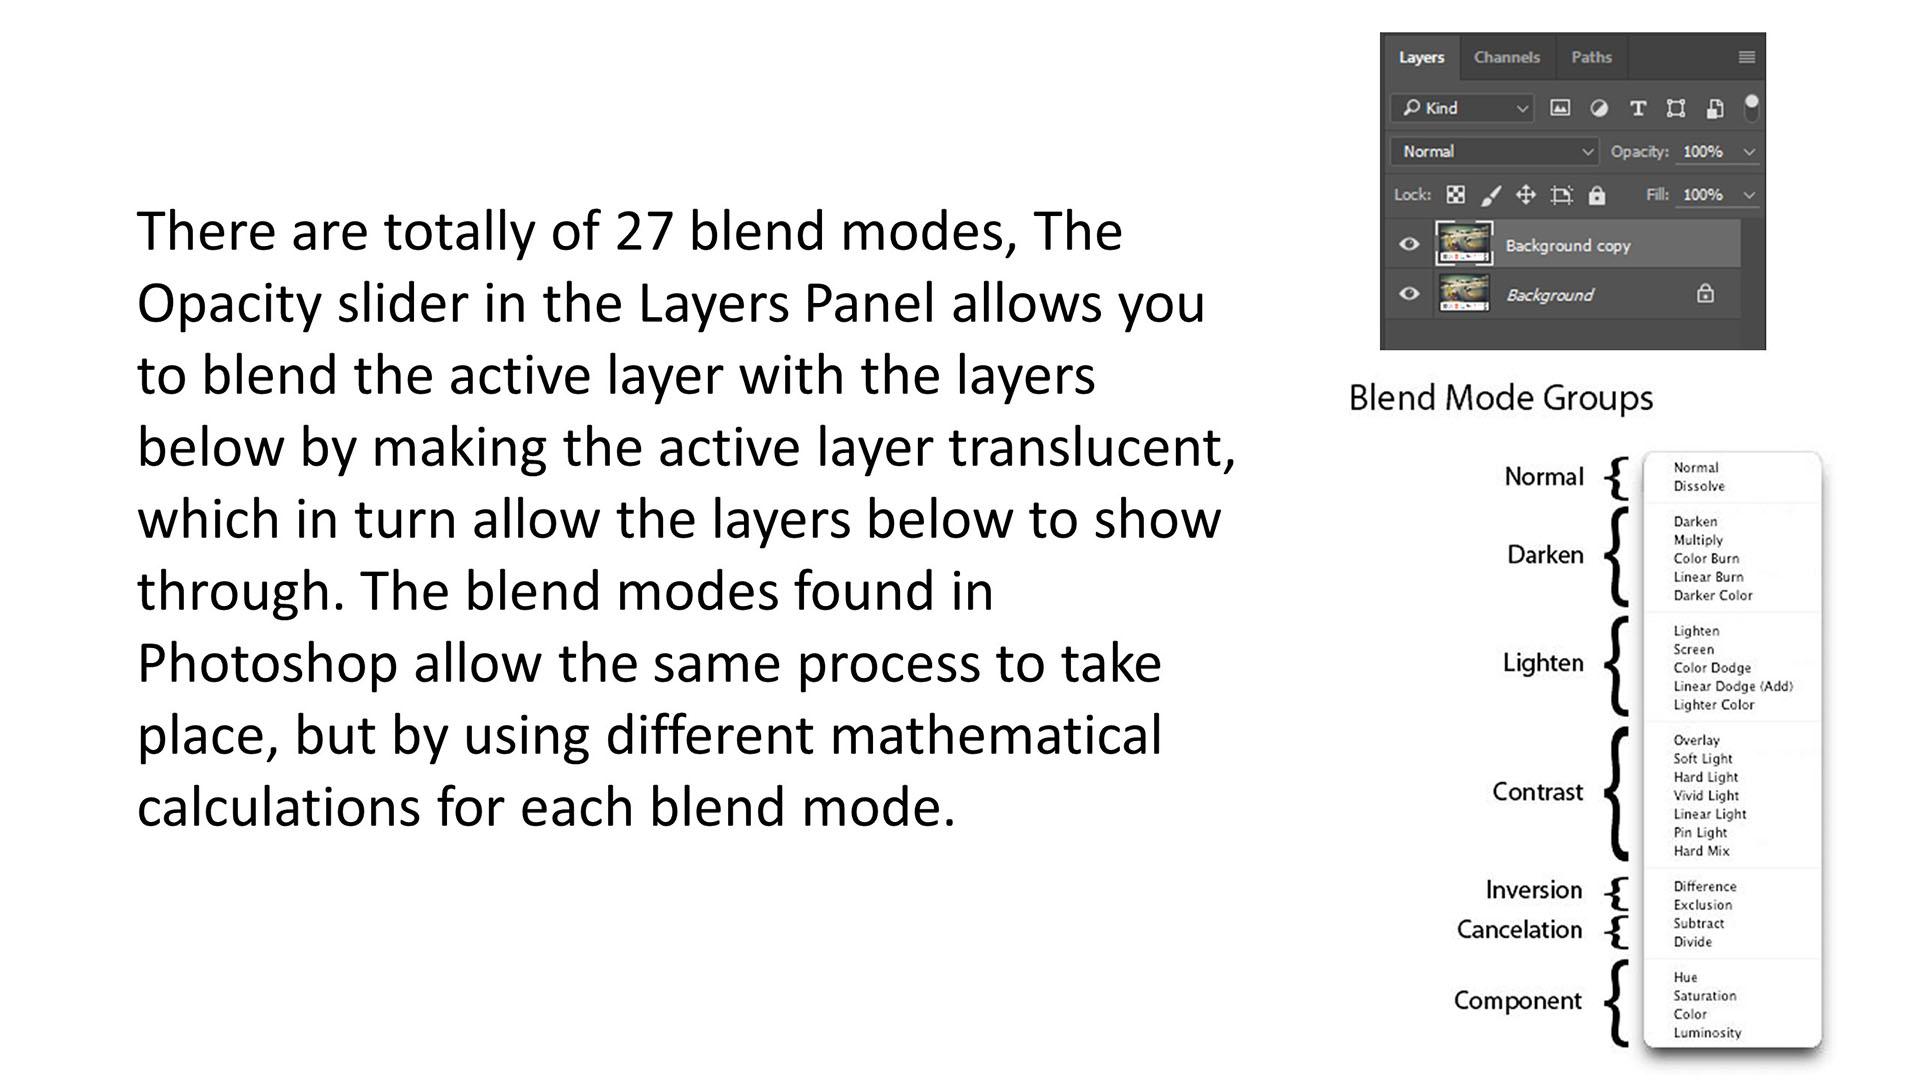 Adobe Photoshop blending mode